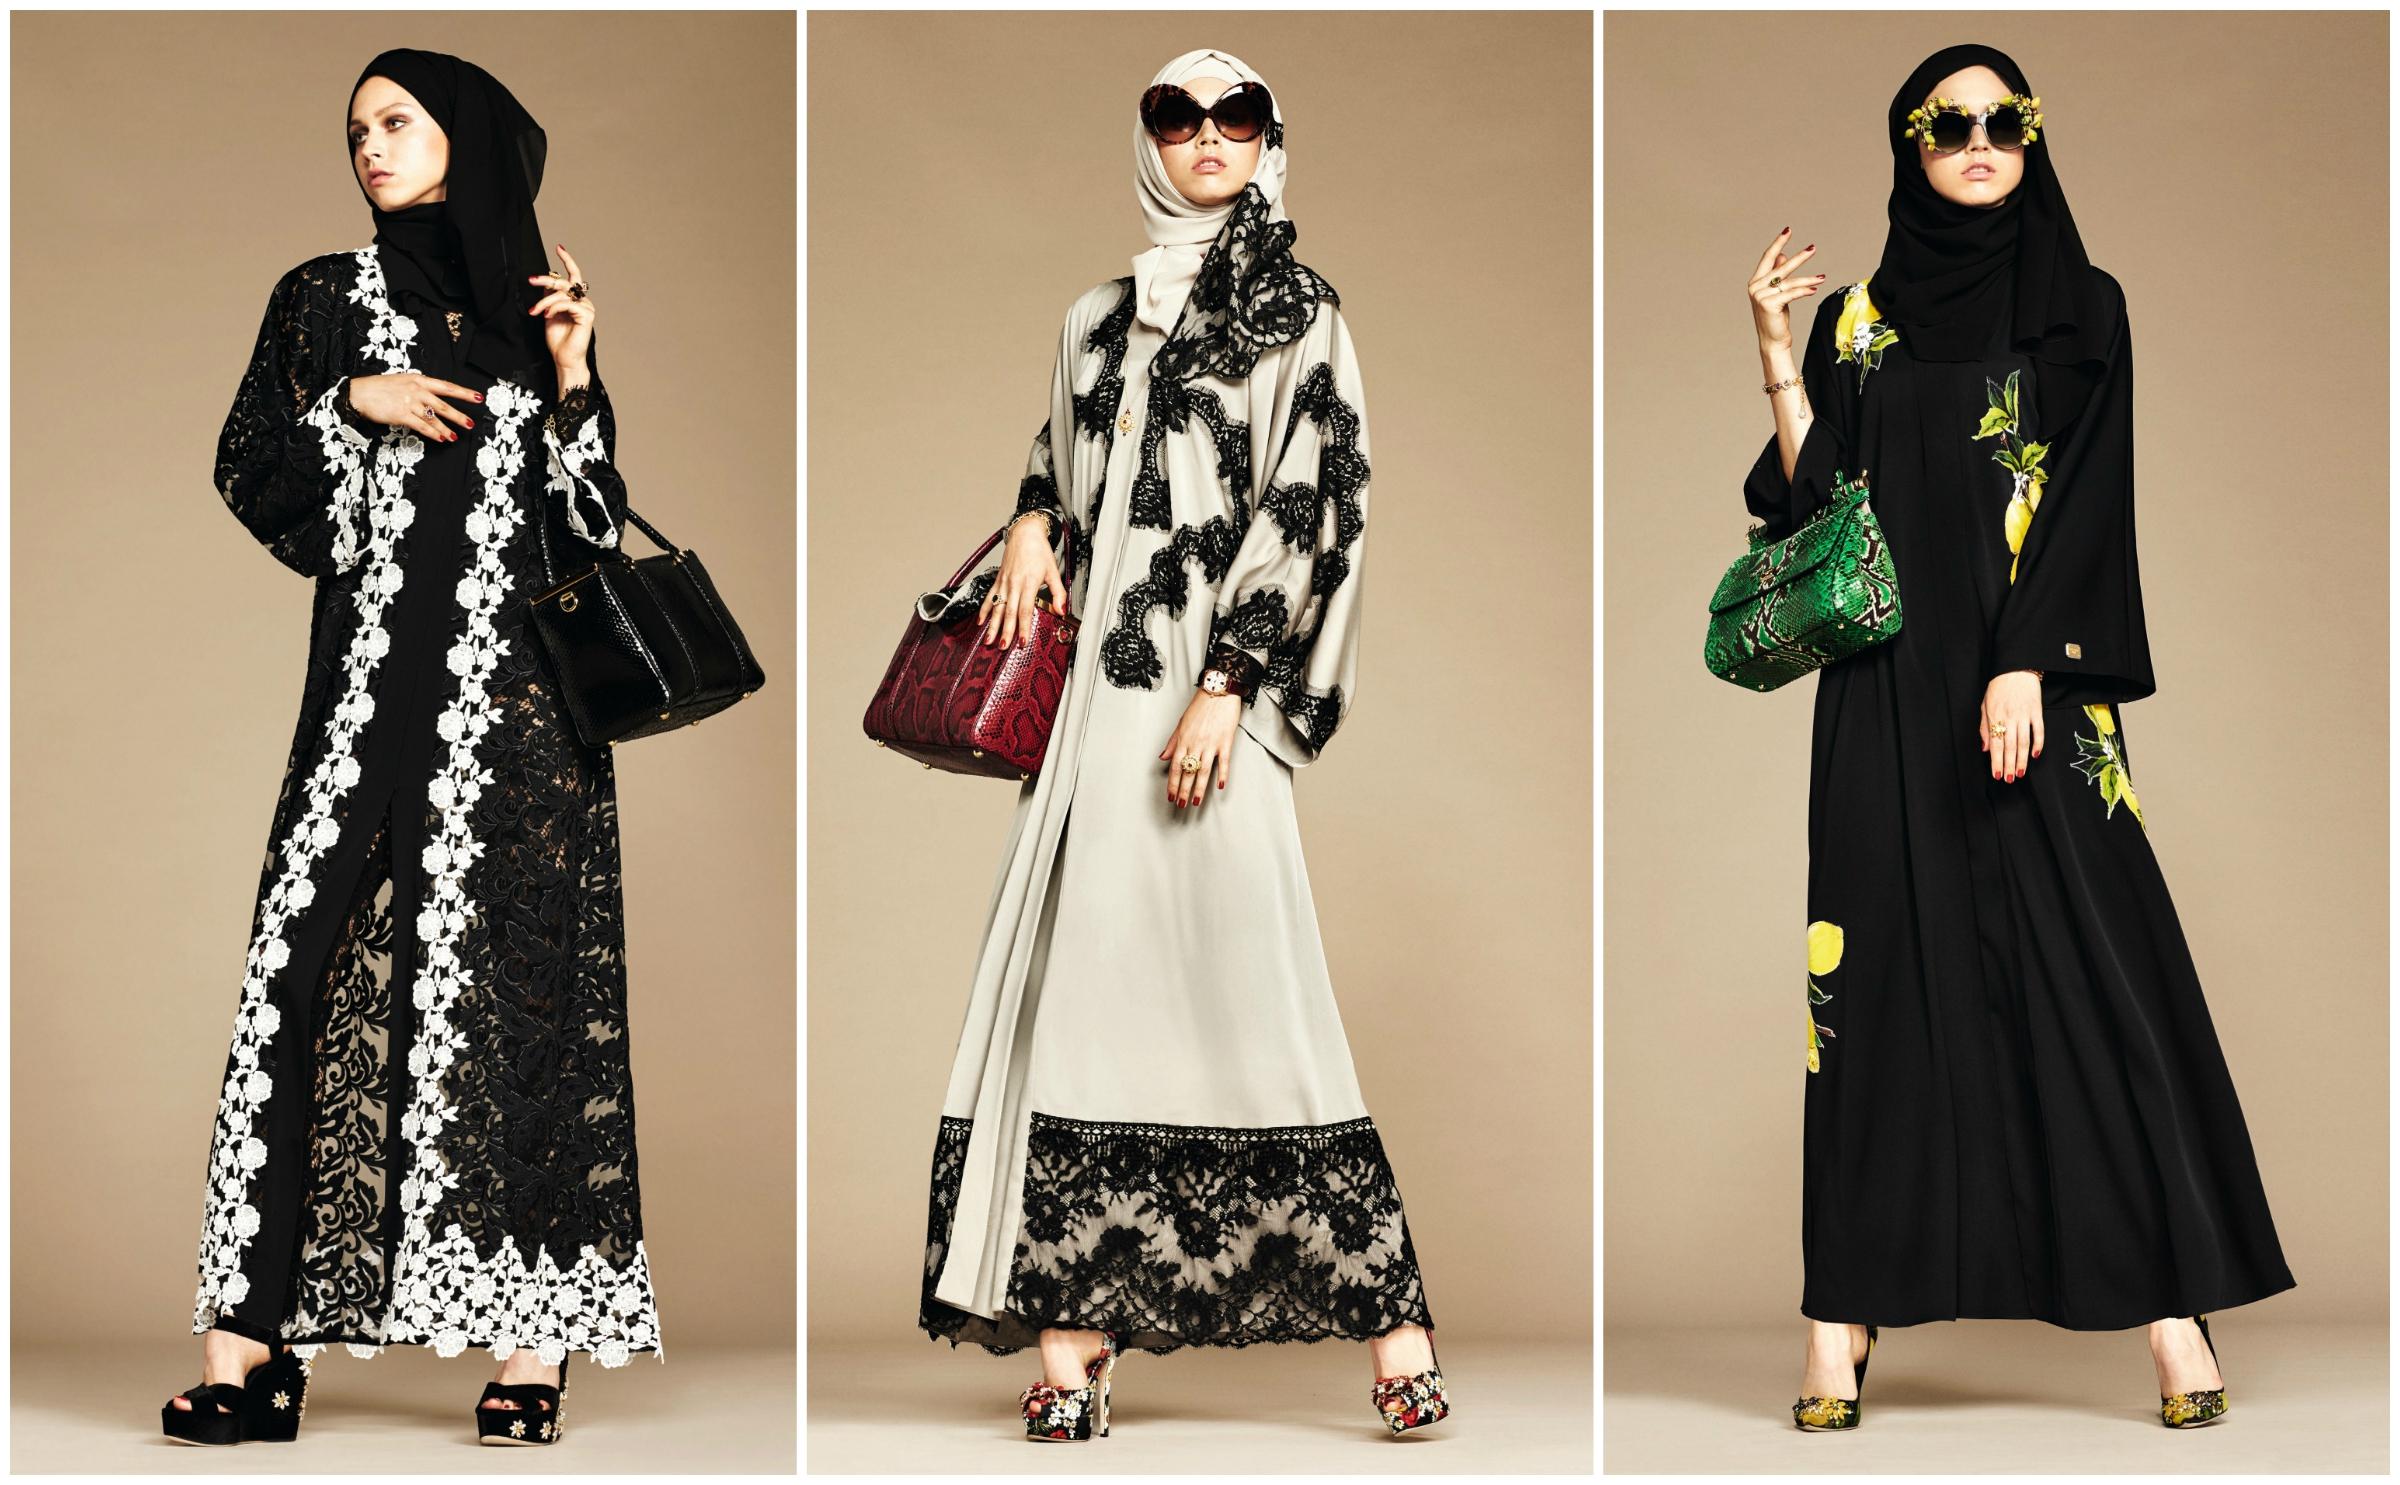 Dolce & Gabbana's new abaya and hijab line, debuted on Style.com/Arabia